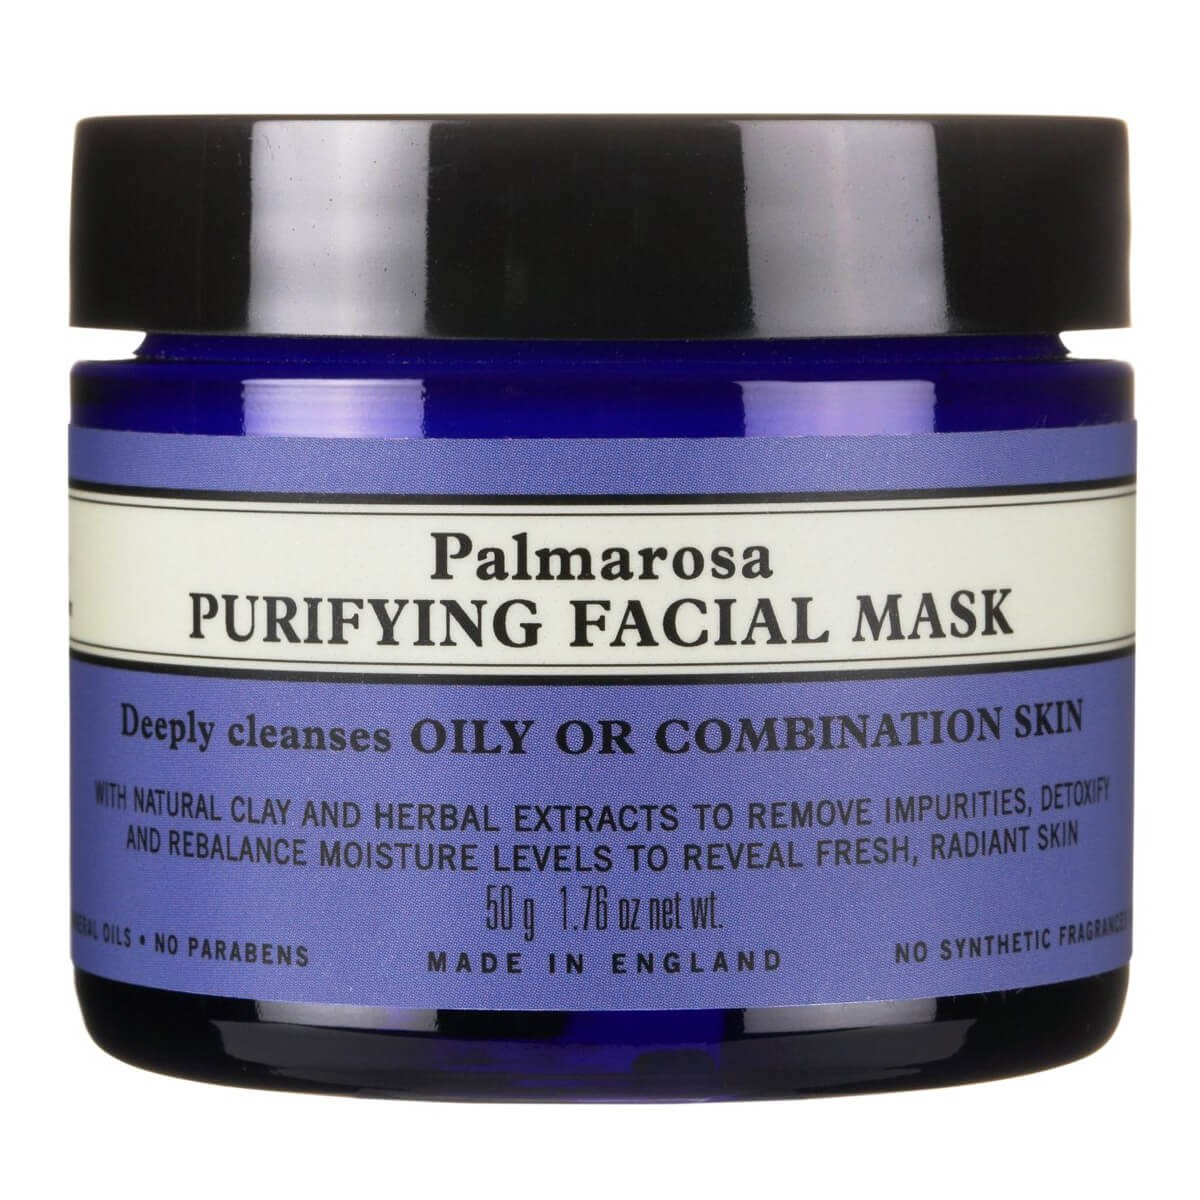 Neal's Yard Remedies Palmarosa Purifying Facial Mask